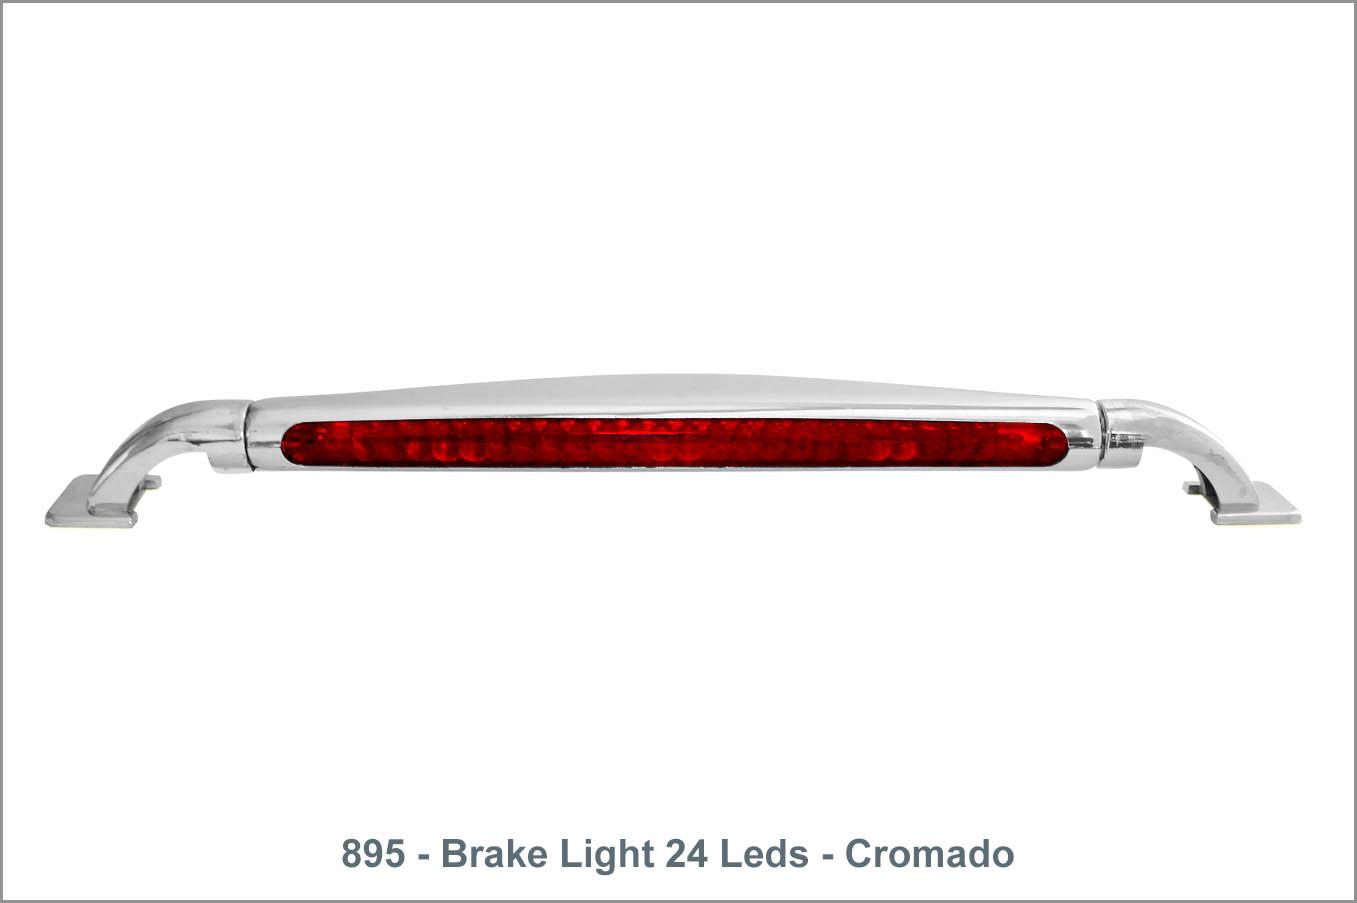 895 - Brake Light 24 Leds - Cromado